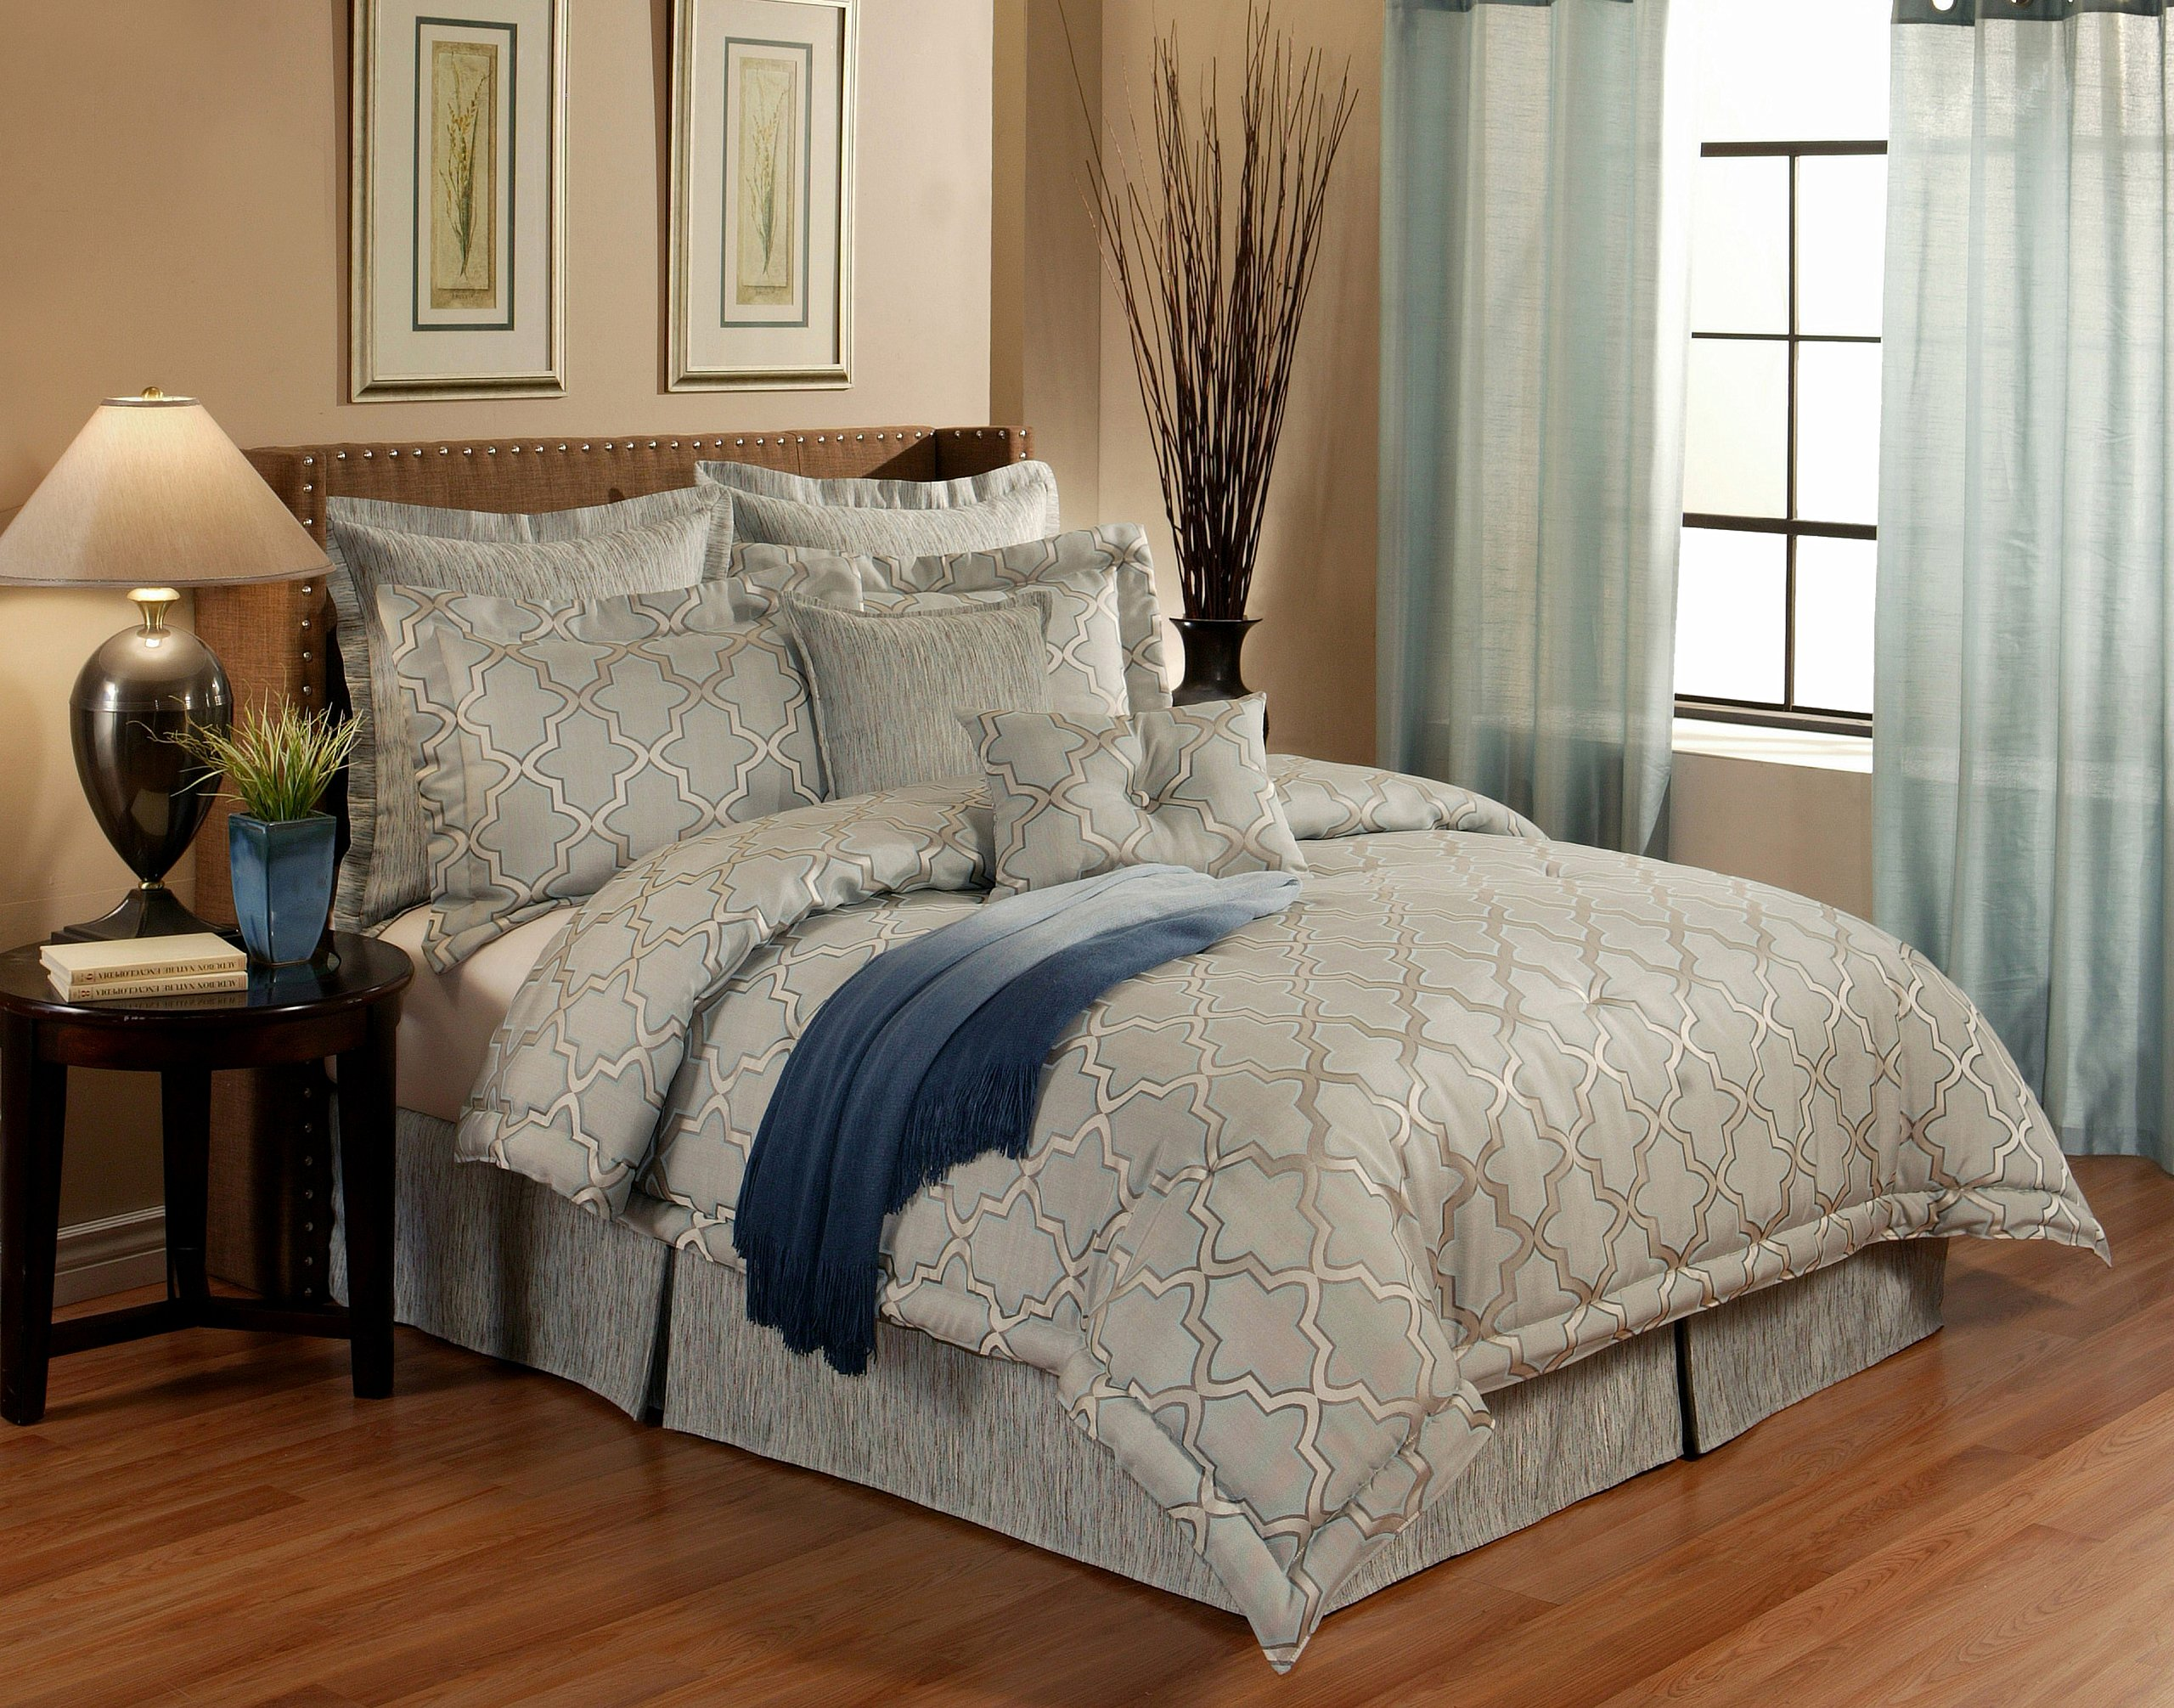 Austin Horn En' Vogue 4 piece Glamour Comforter Set, California King, Spa Blue